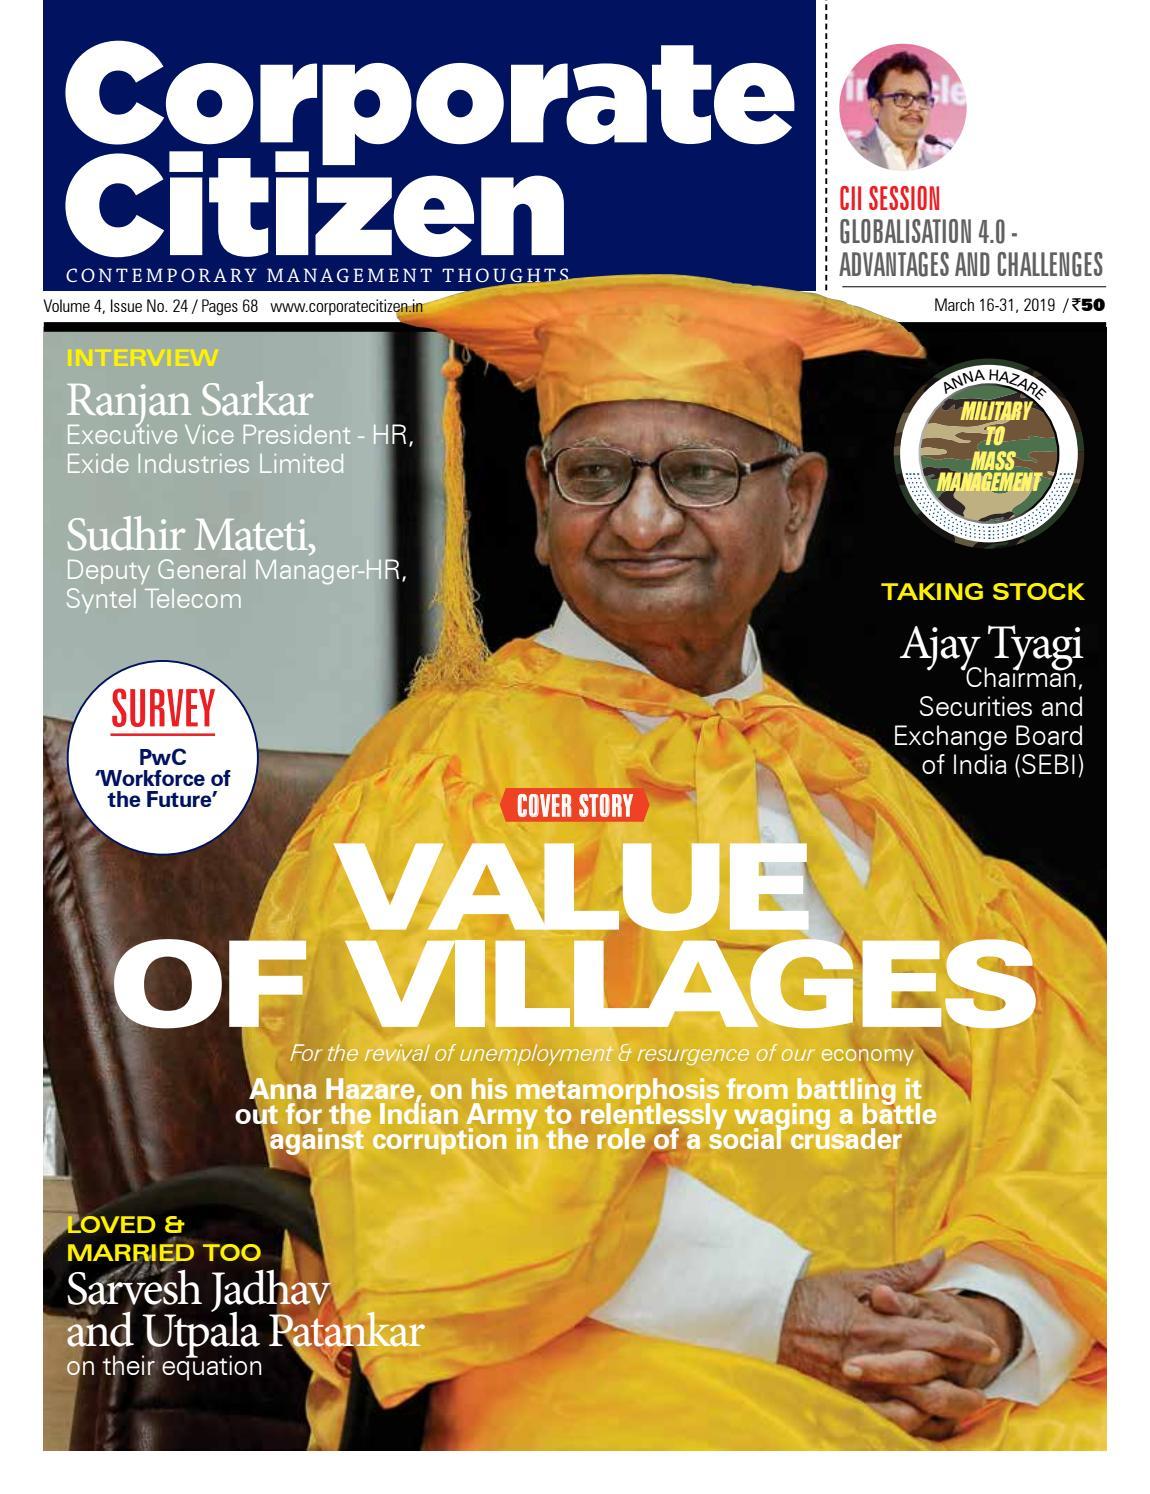 Volume4 issue 24 corporate citizen by Corporate Citizen - issuu